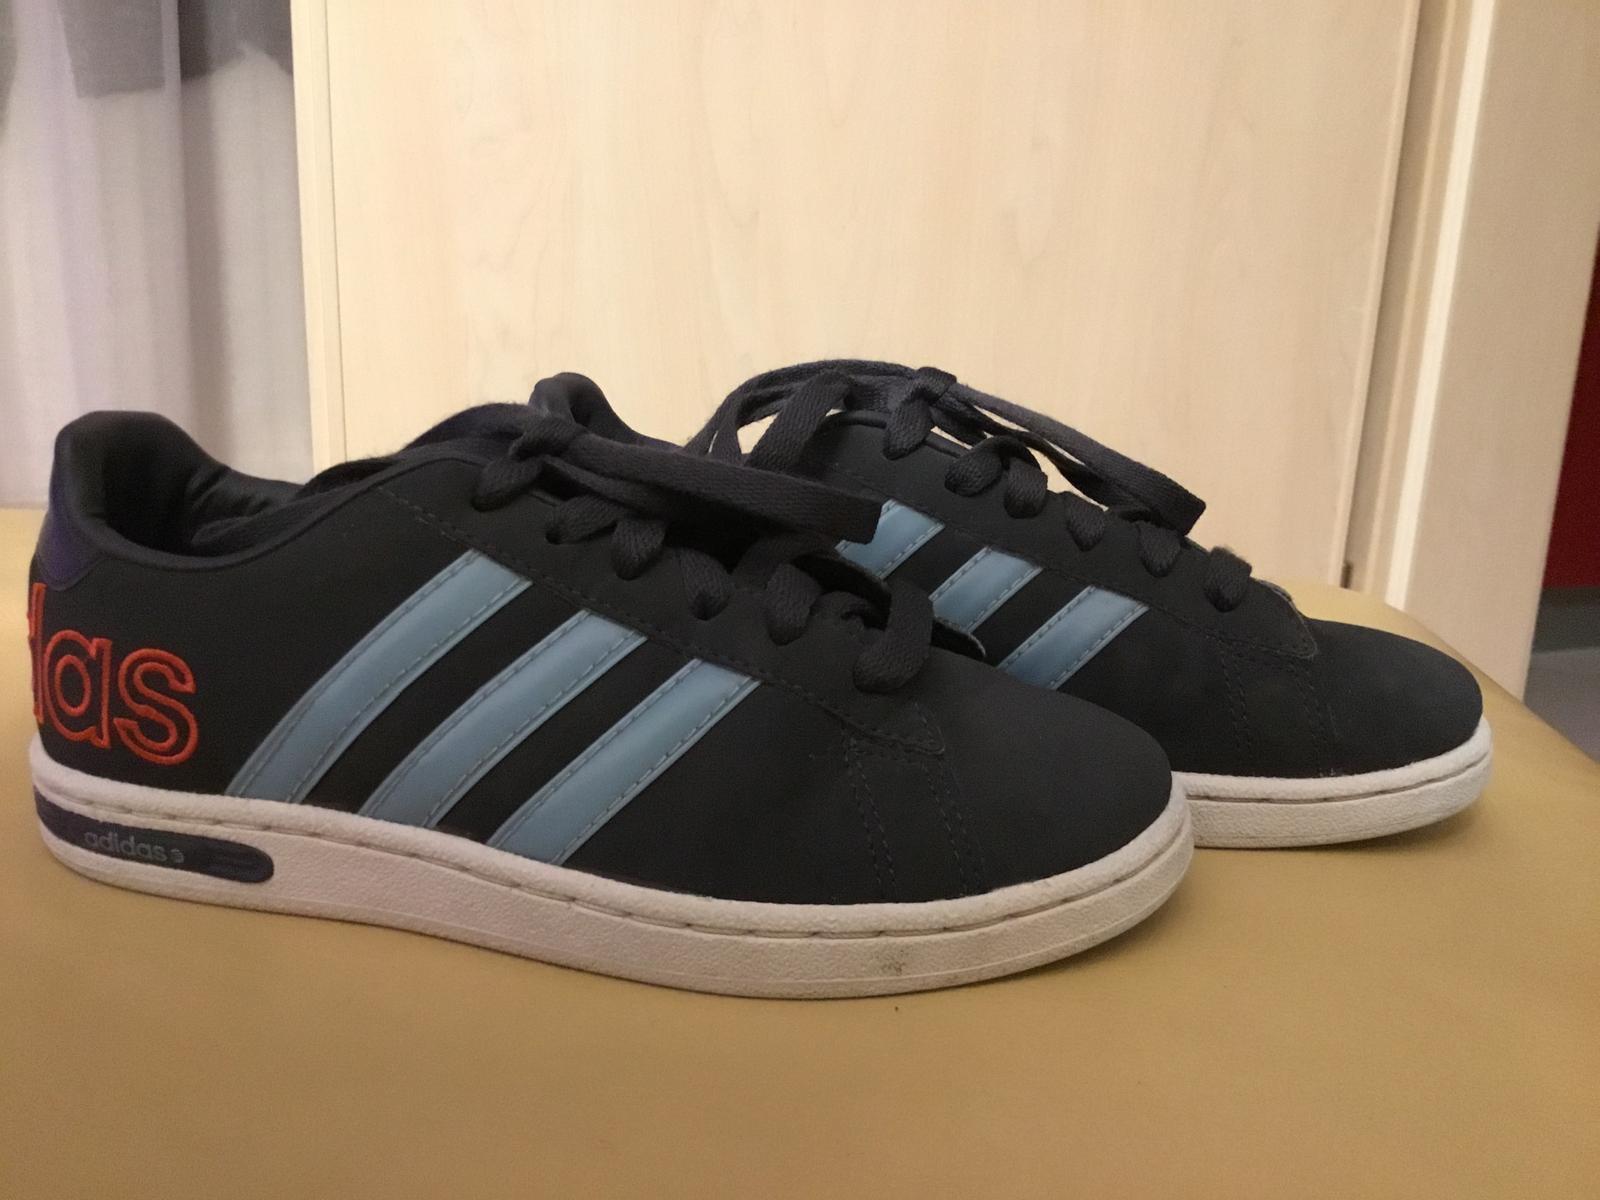 Skvelé ľahké botasky uk 1 379a167dfdd